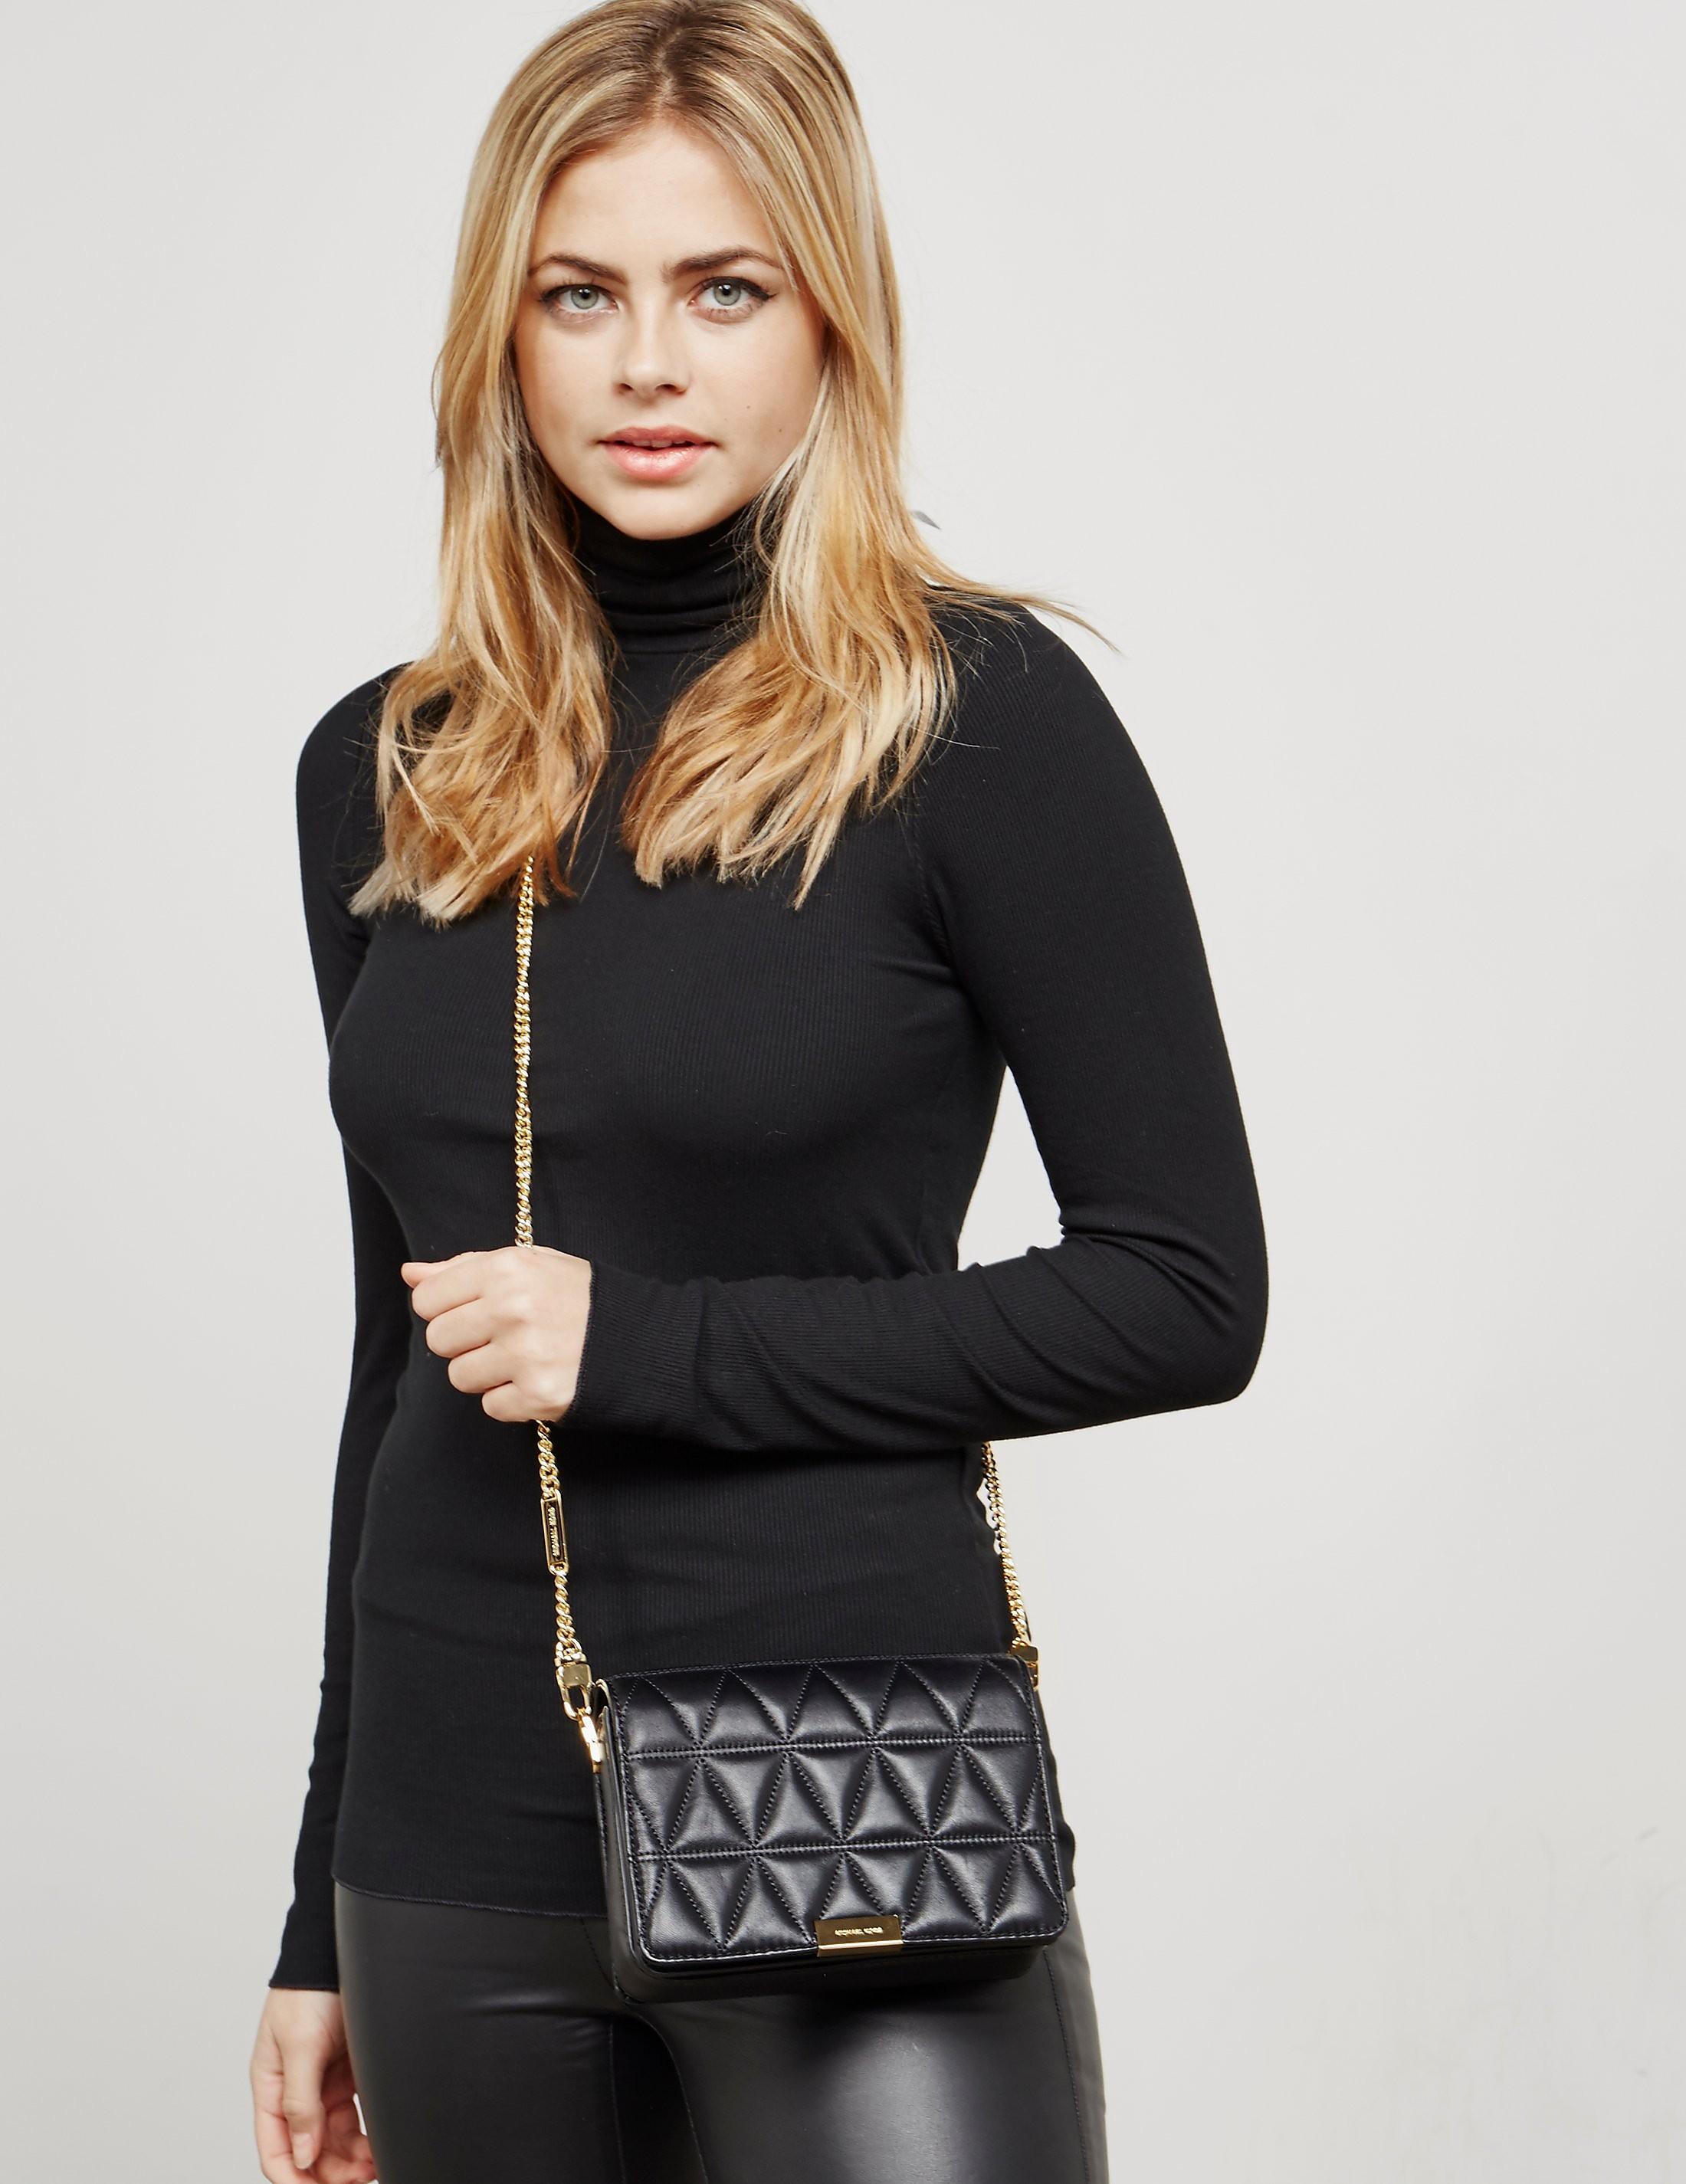 Michael Kors Jade Quilted Clutch Bag